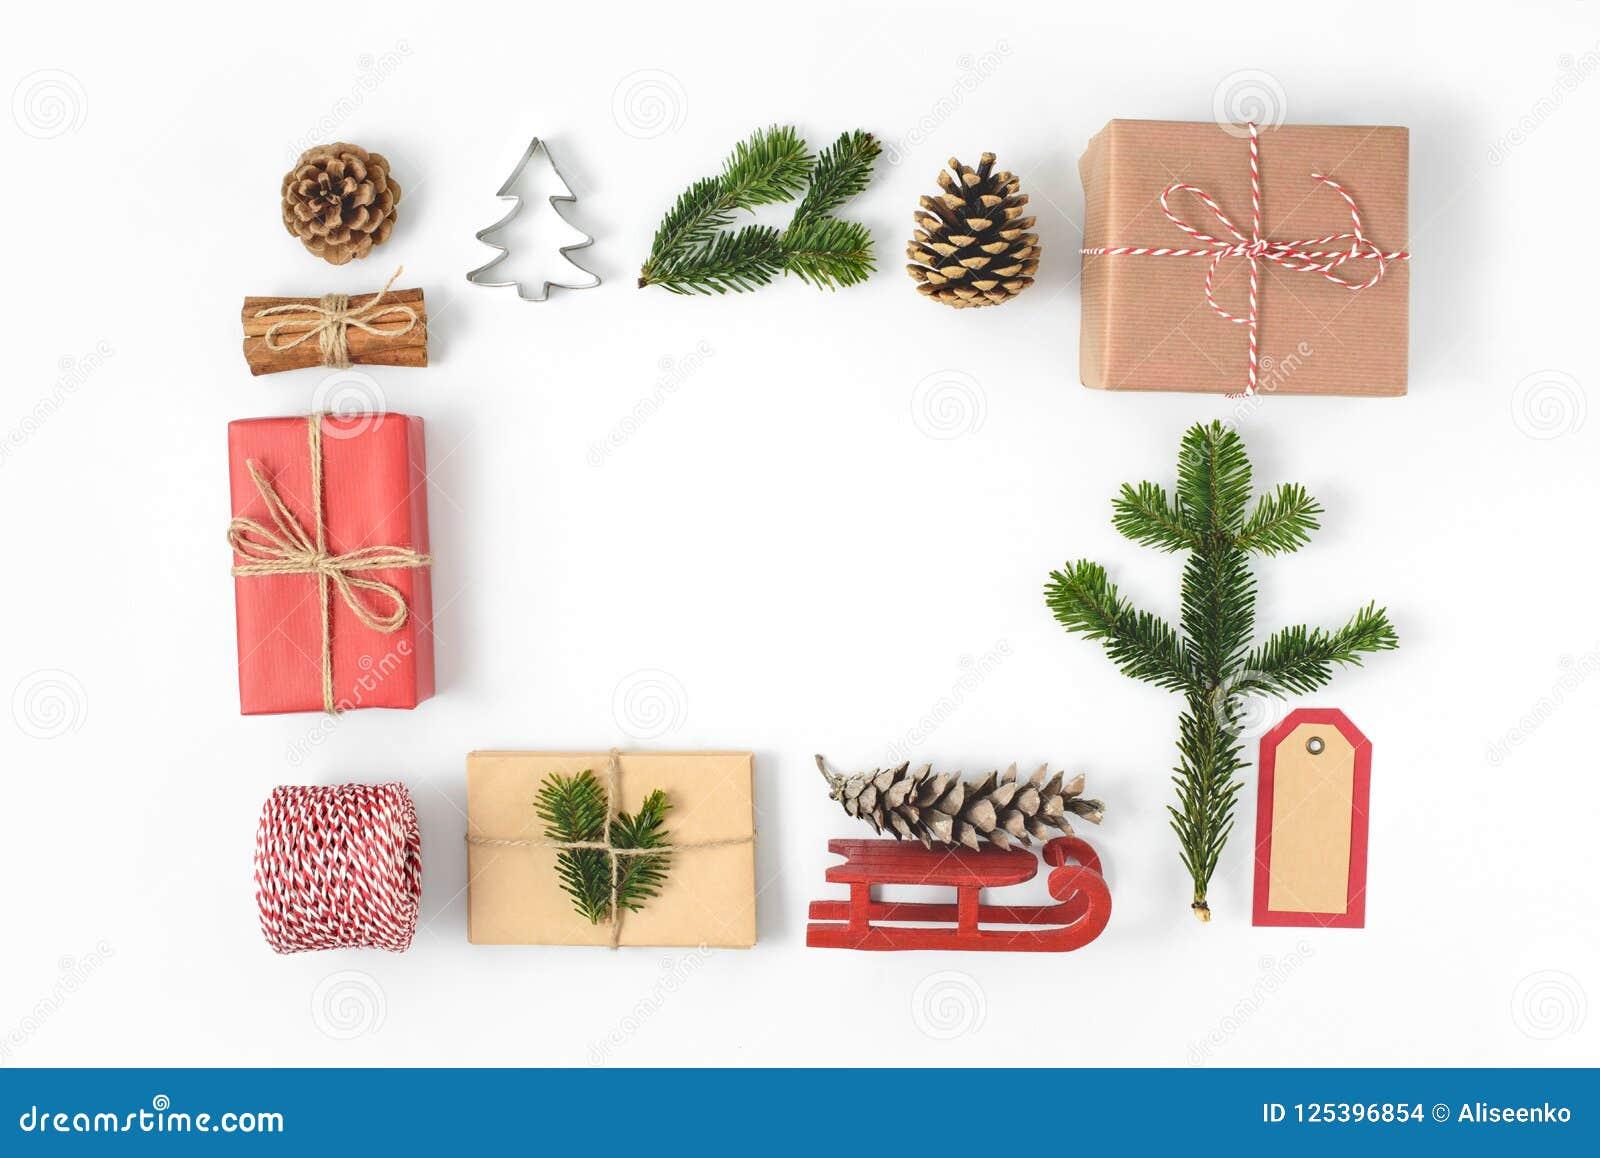 e66d6ee9e2e Set Of Various Christmas Details  Gifts